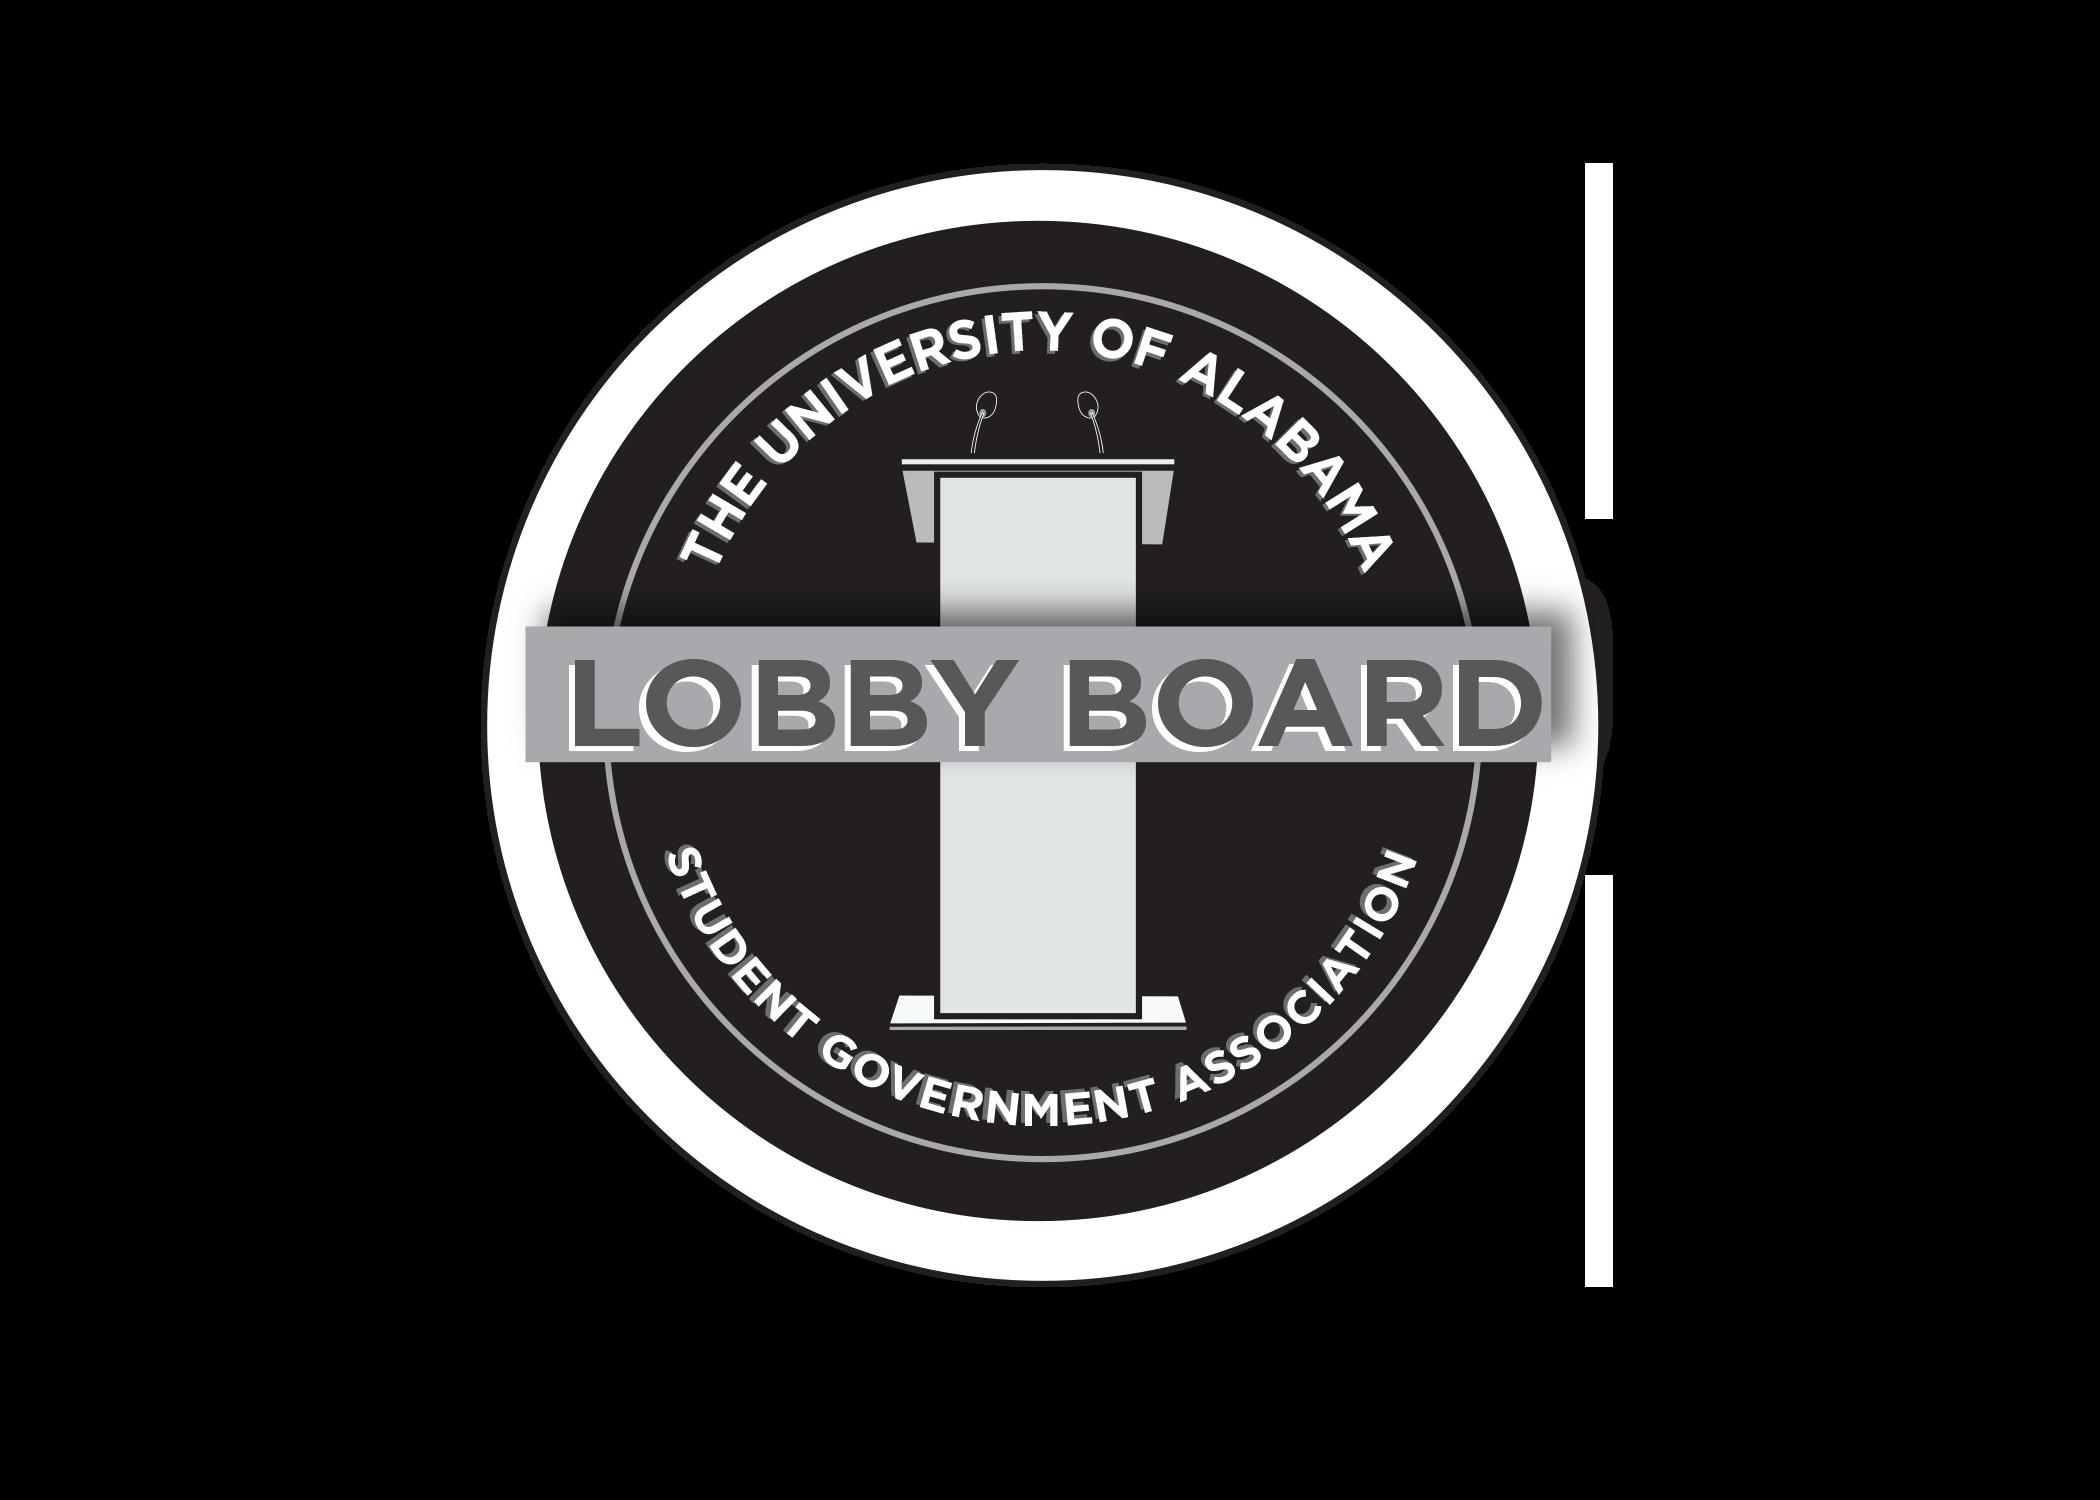 Lobby Board 2021 Application